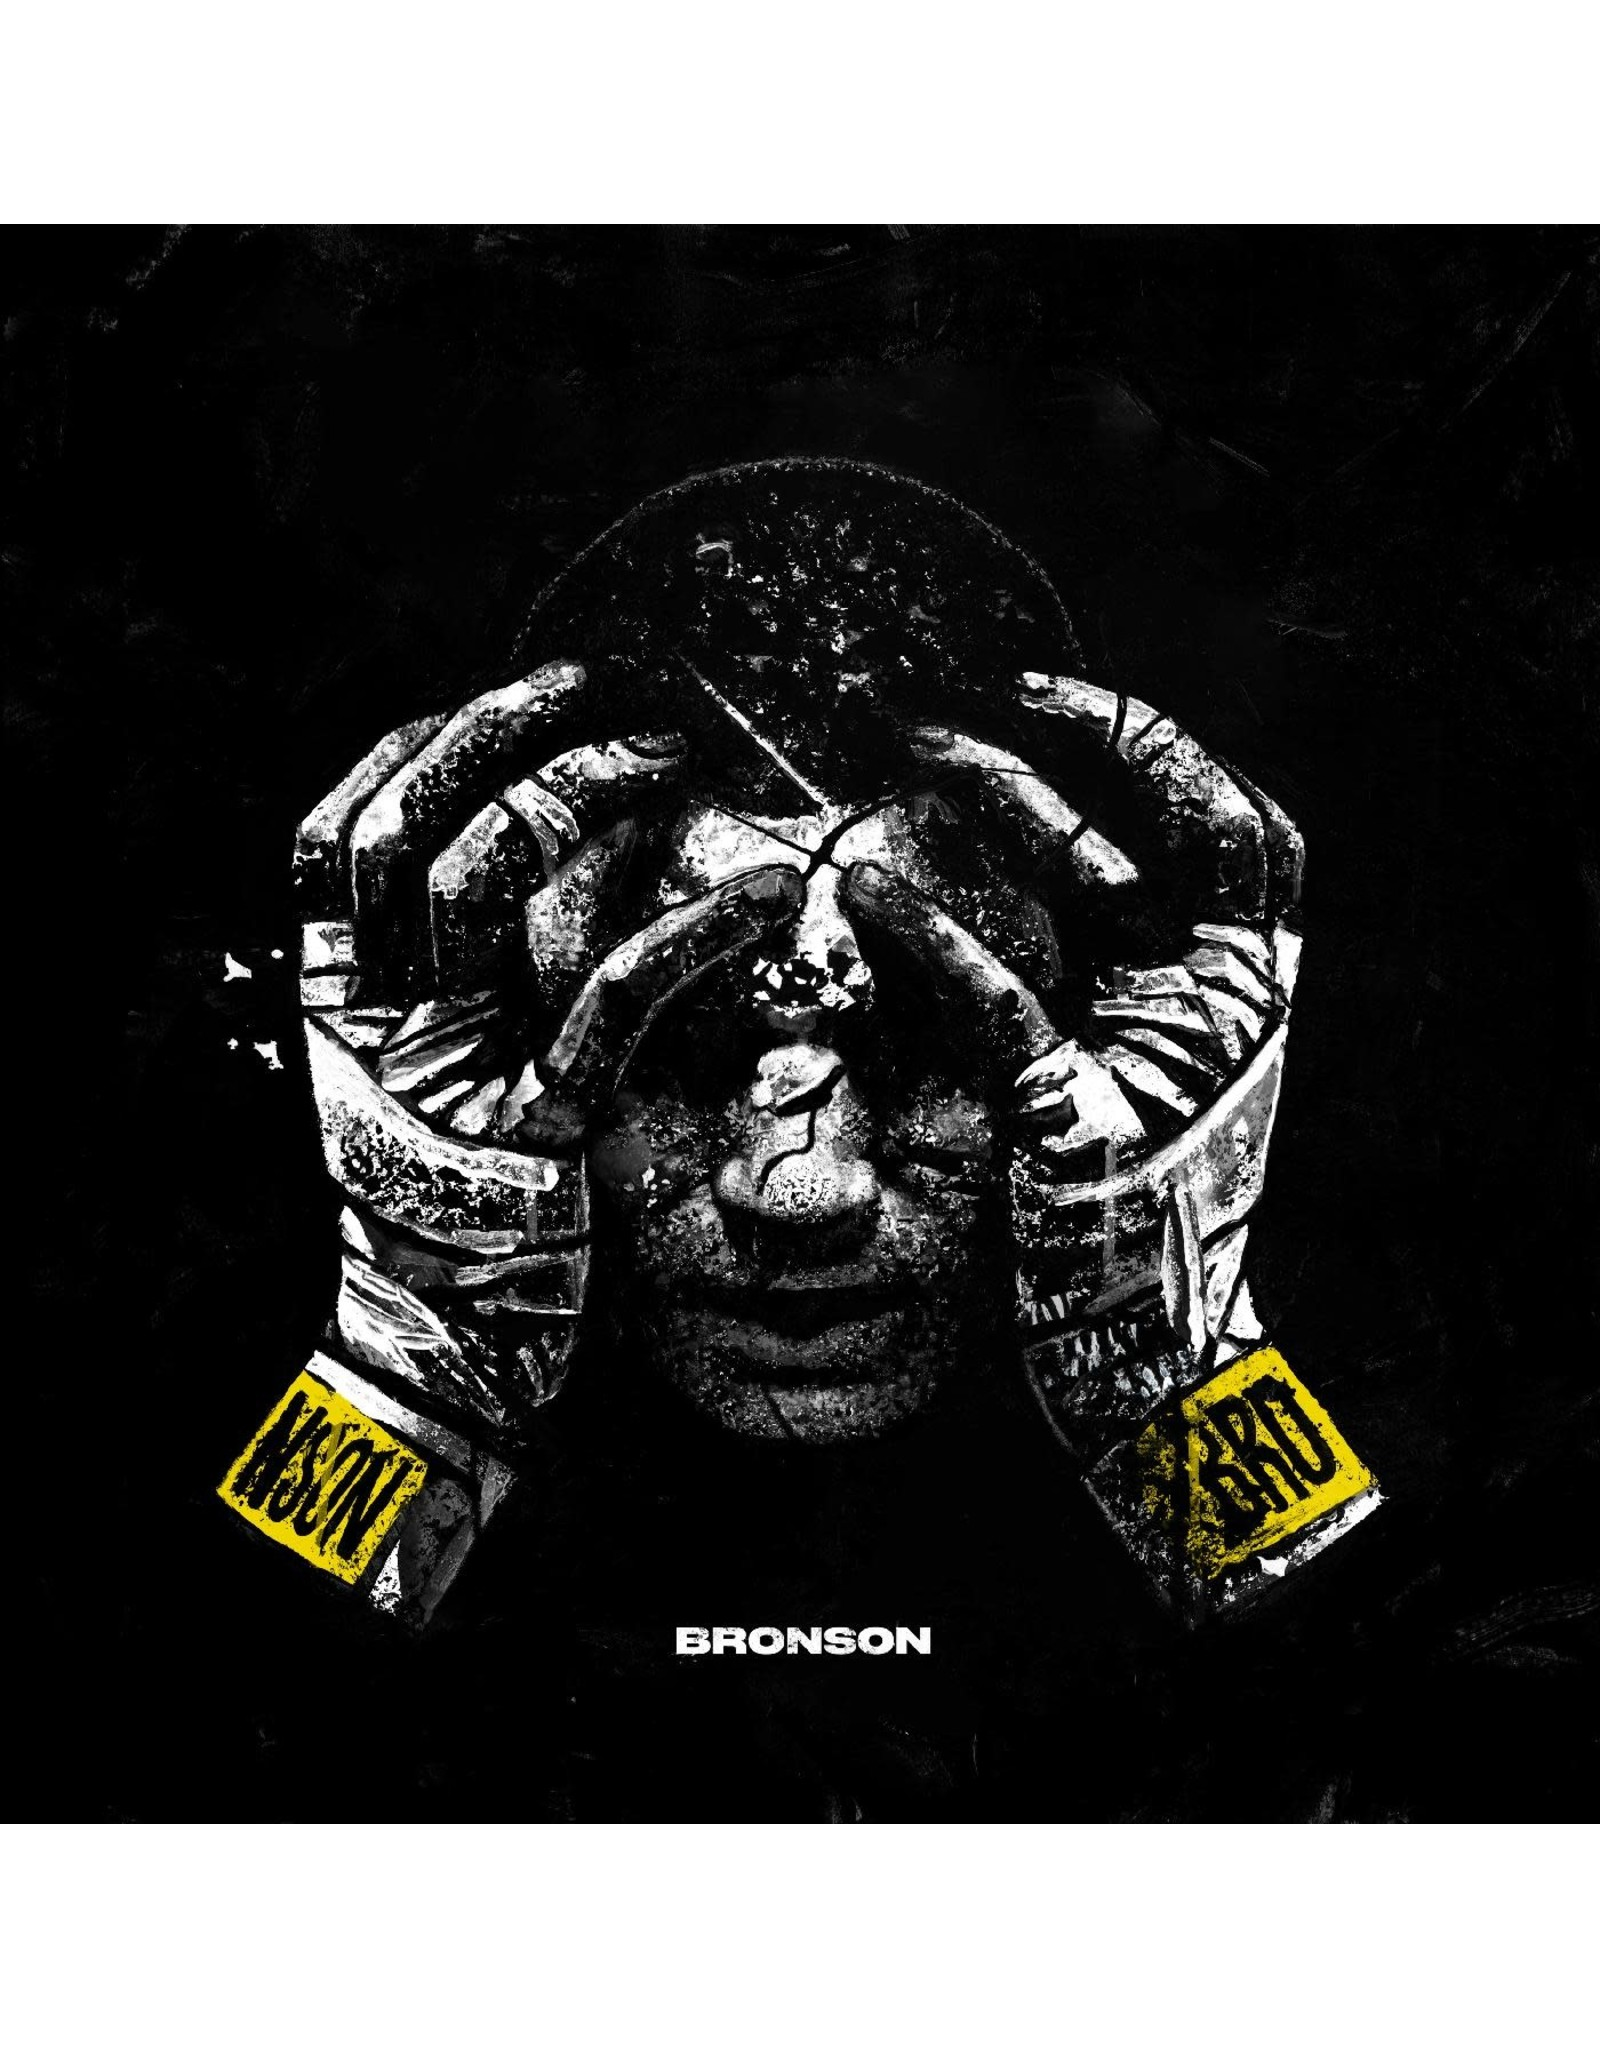 BRONSON - BRONSON (Odesza / Golden Features) [Clear Vinyl]